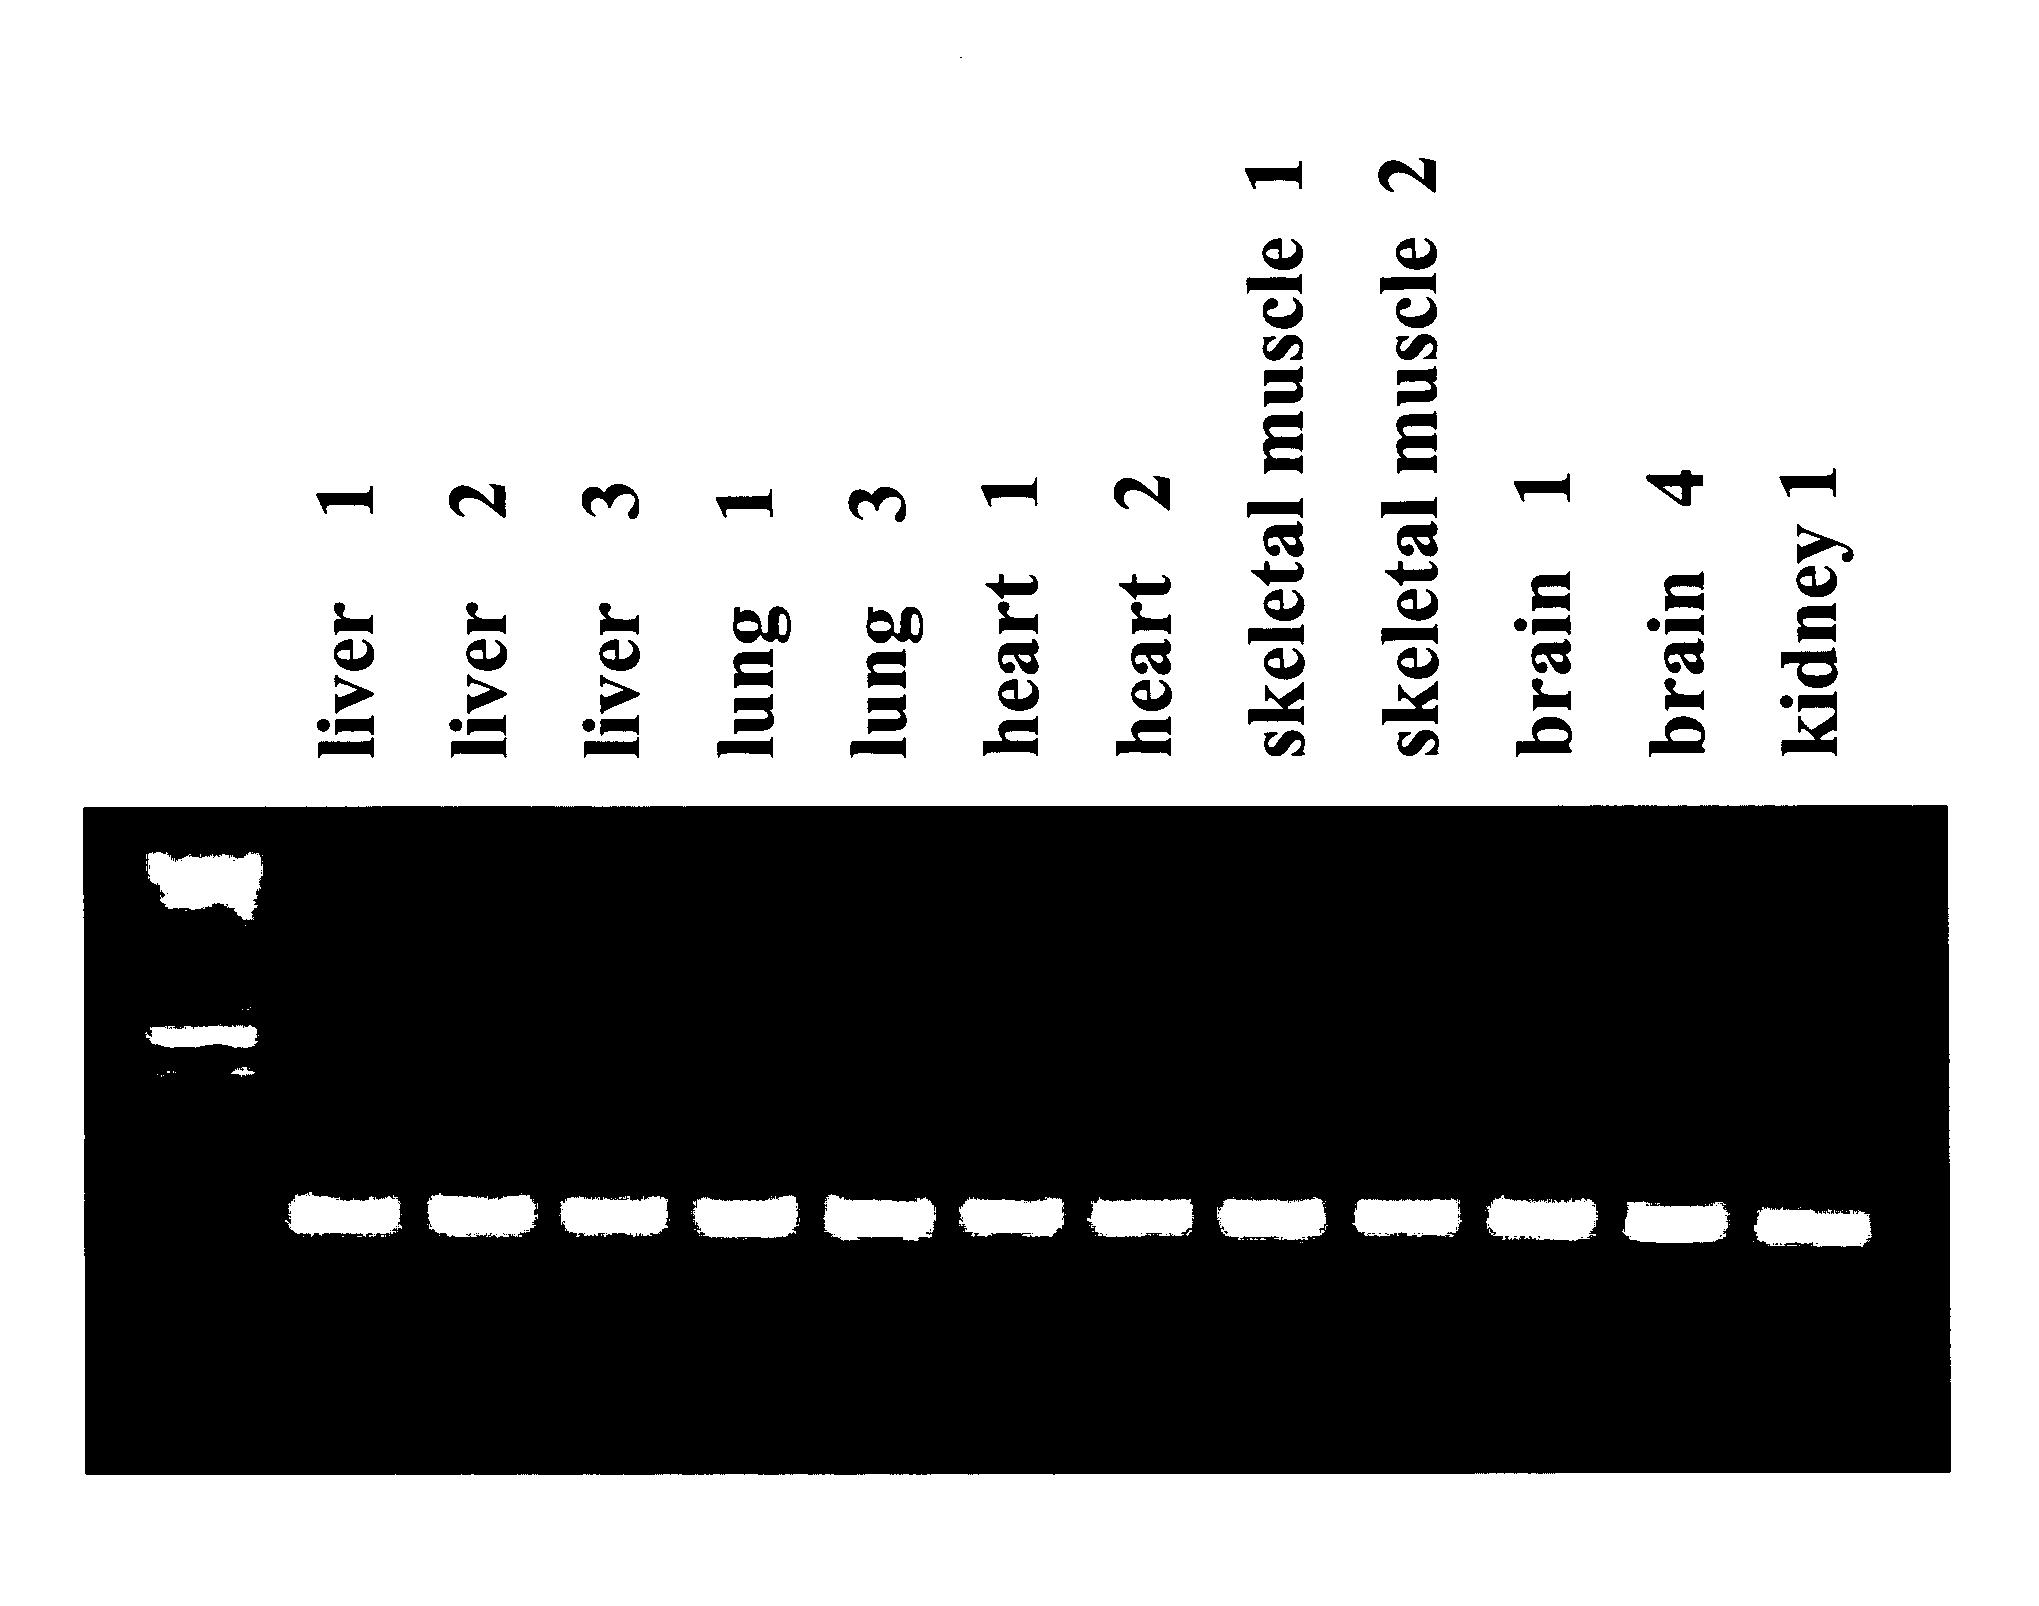 beta actin gene